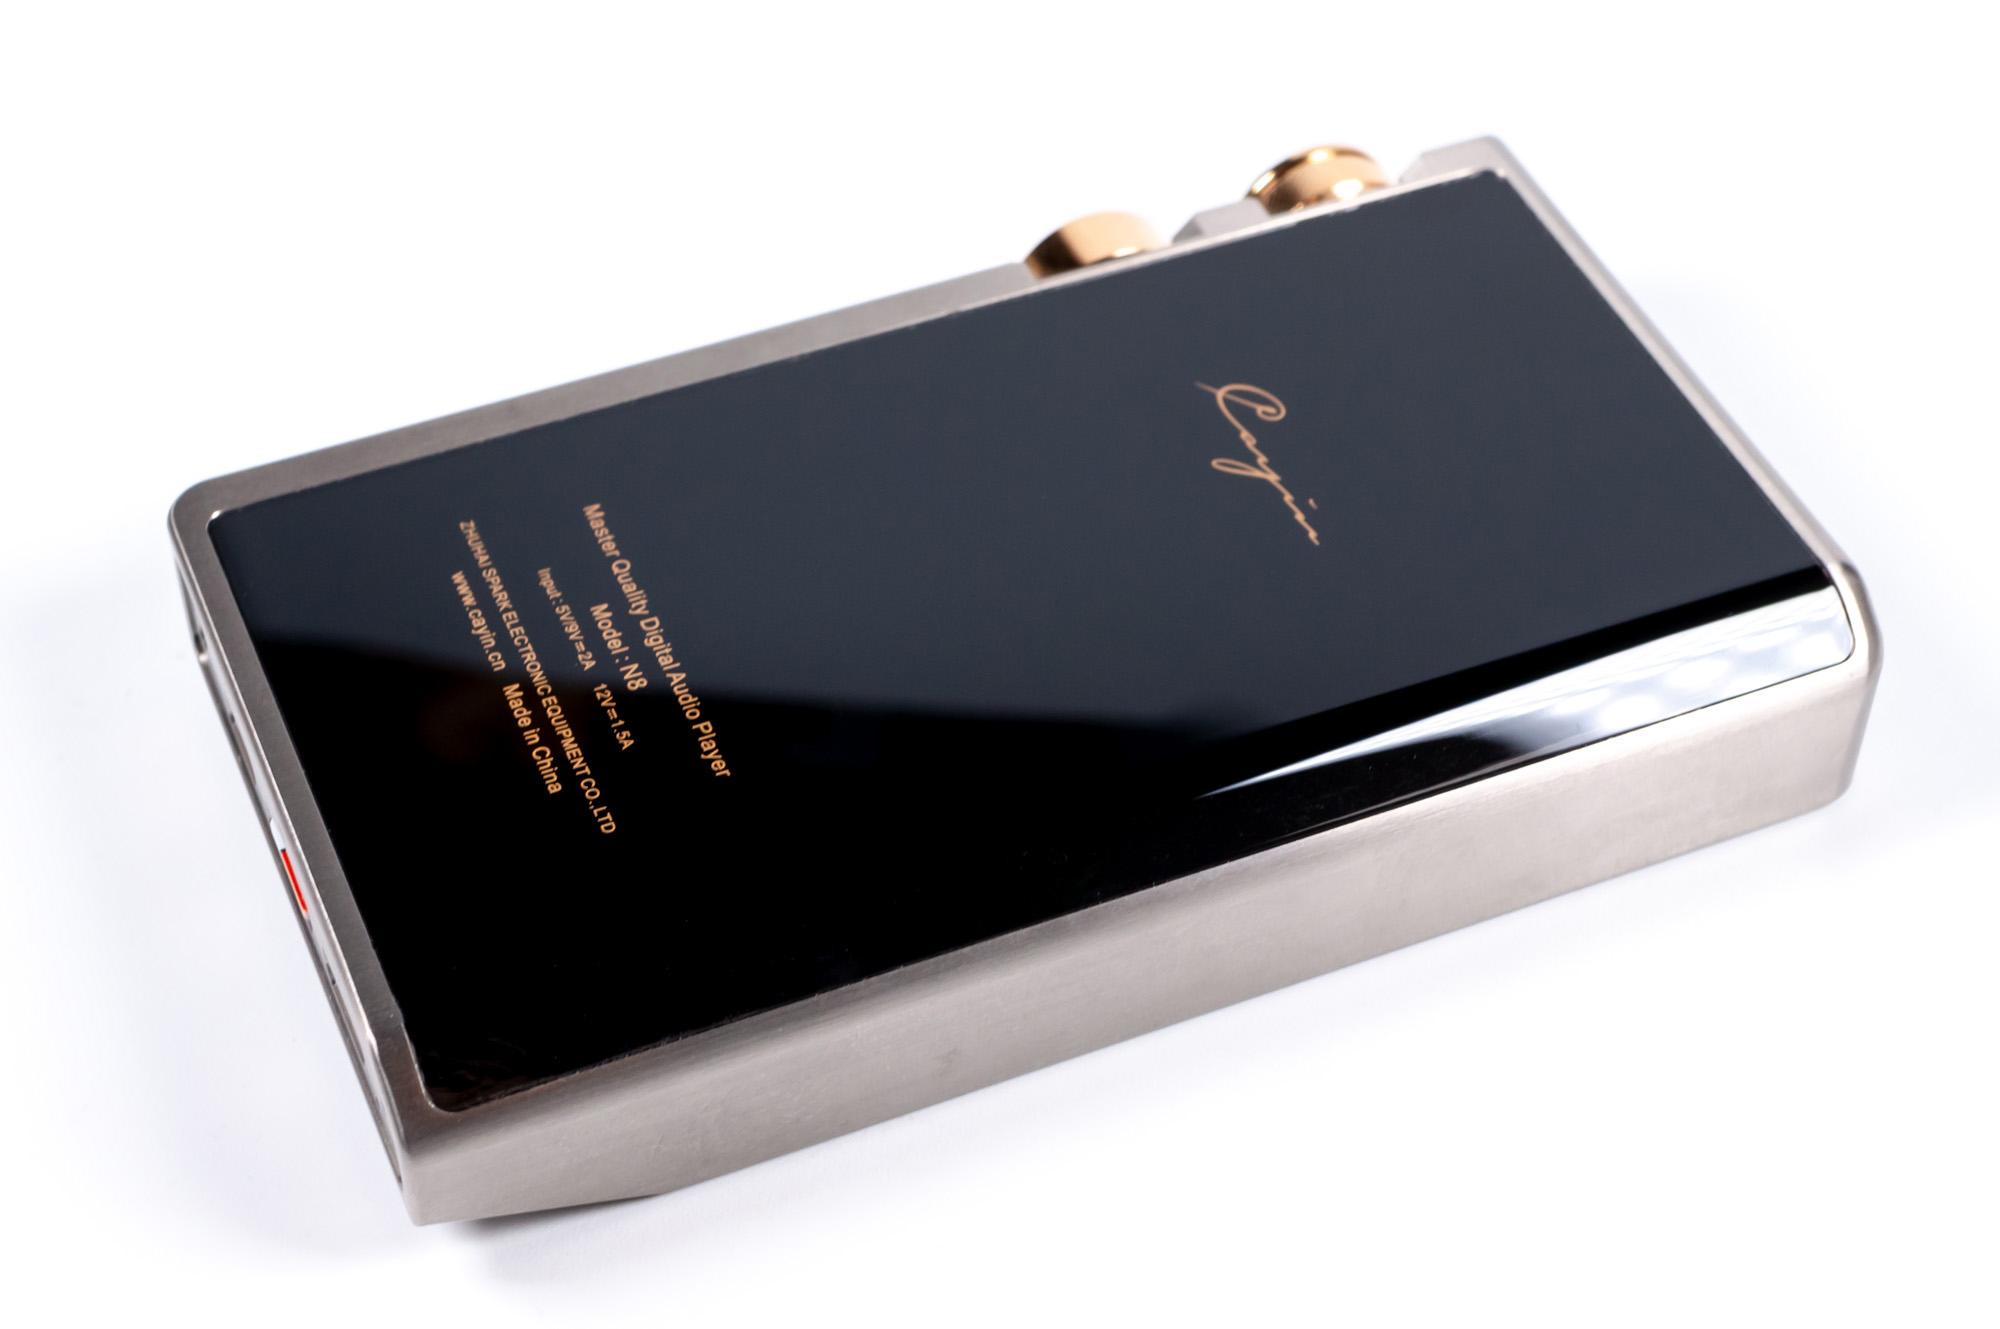 Cayin N8 DAP | Reviews | Headphone Reviews and Discussion - Head-Fi org